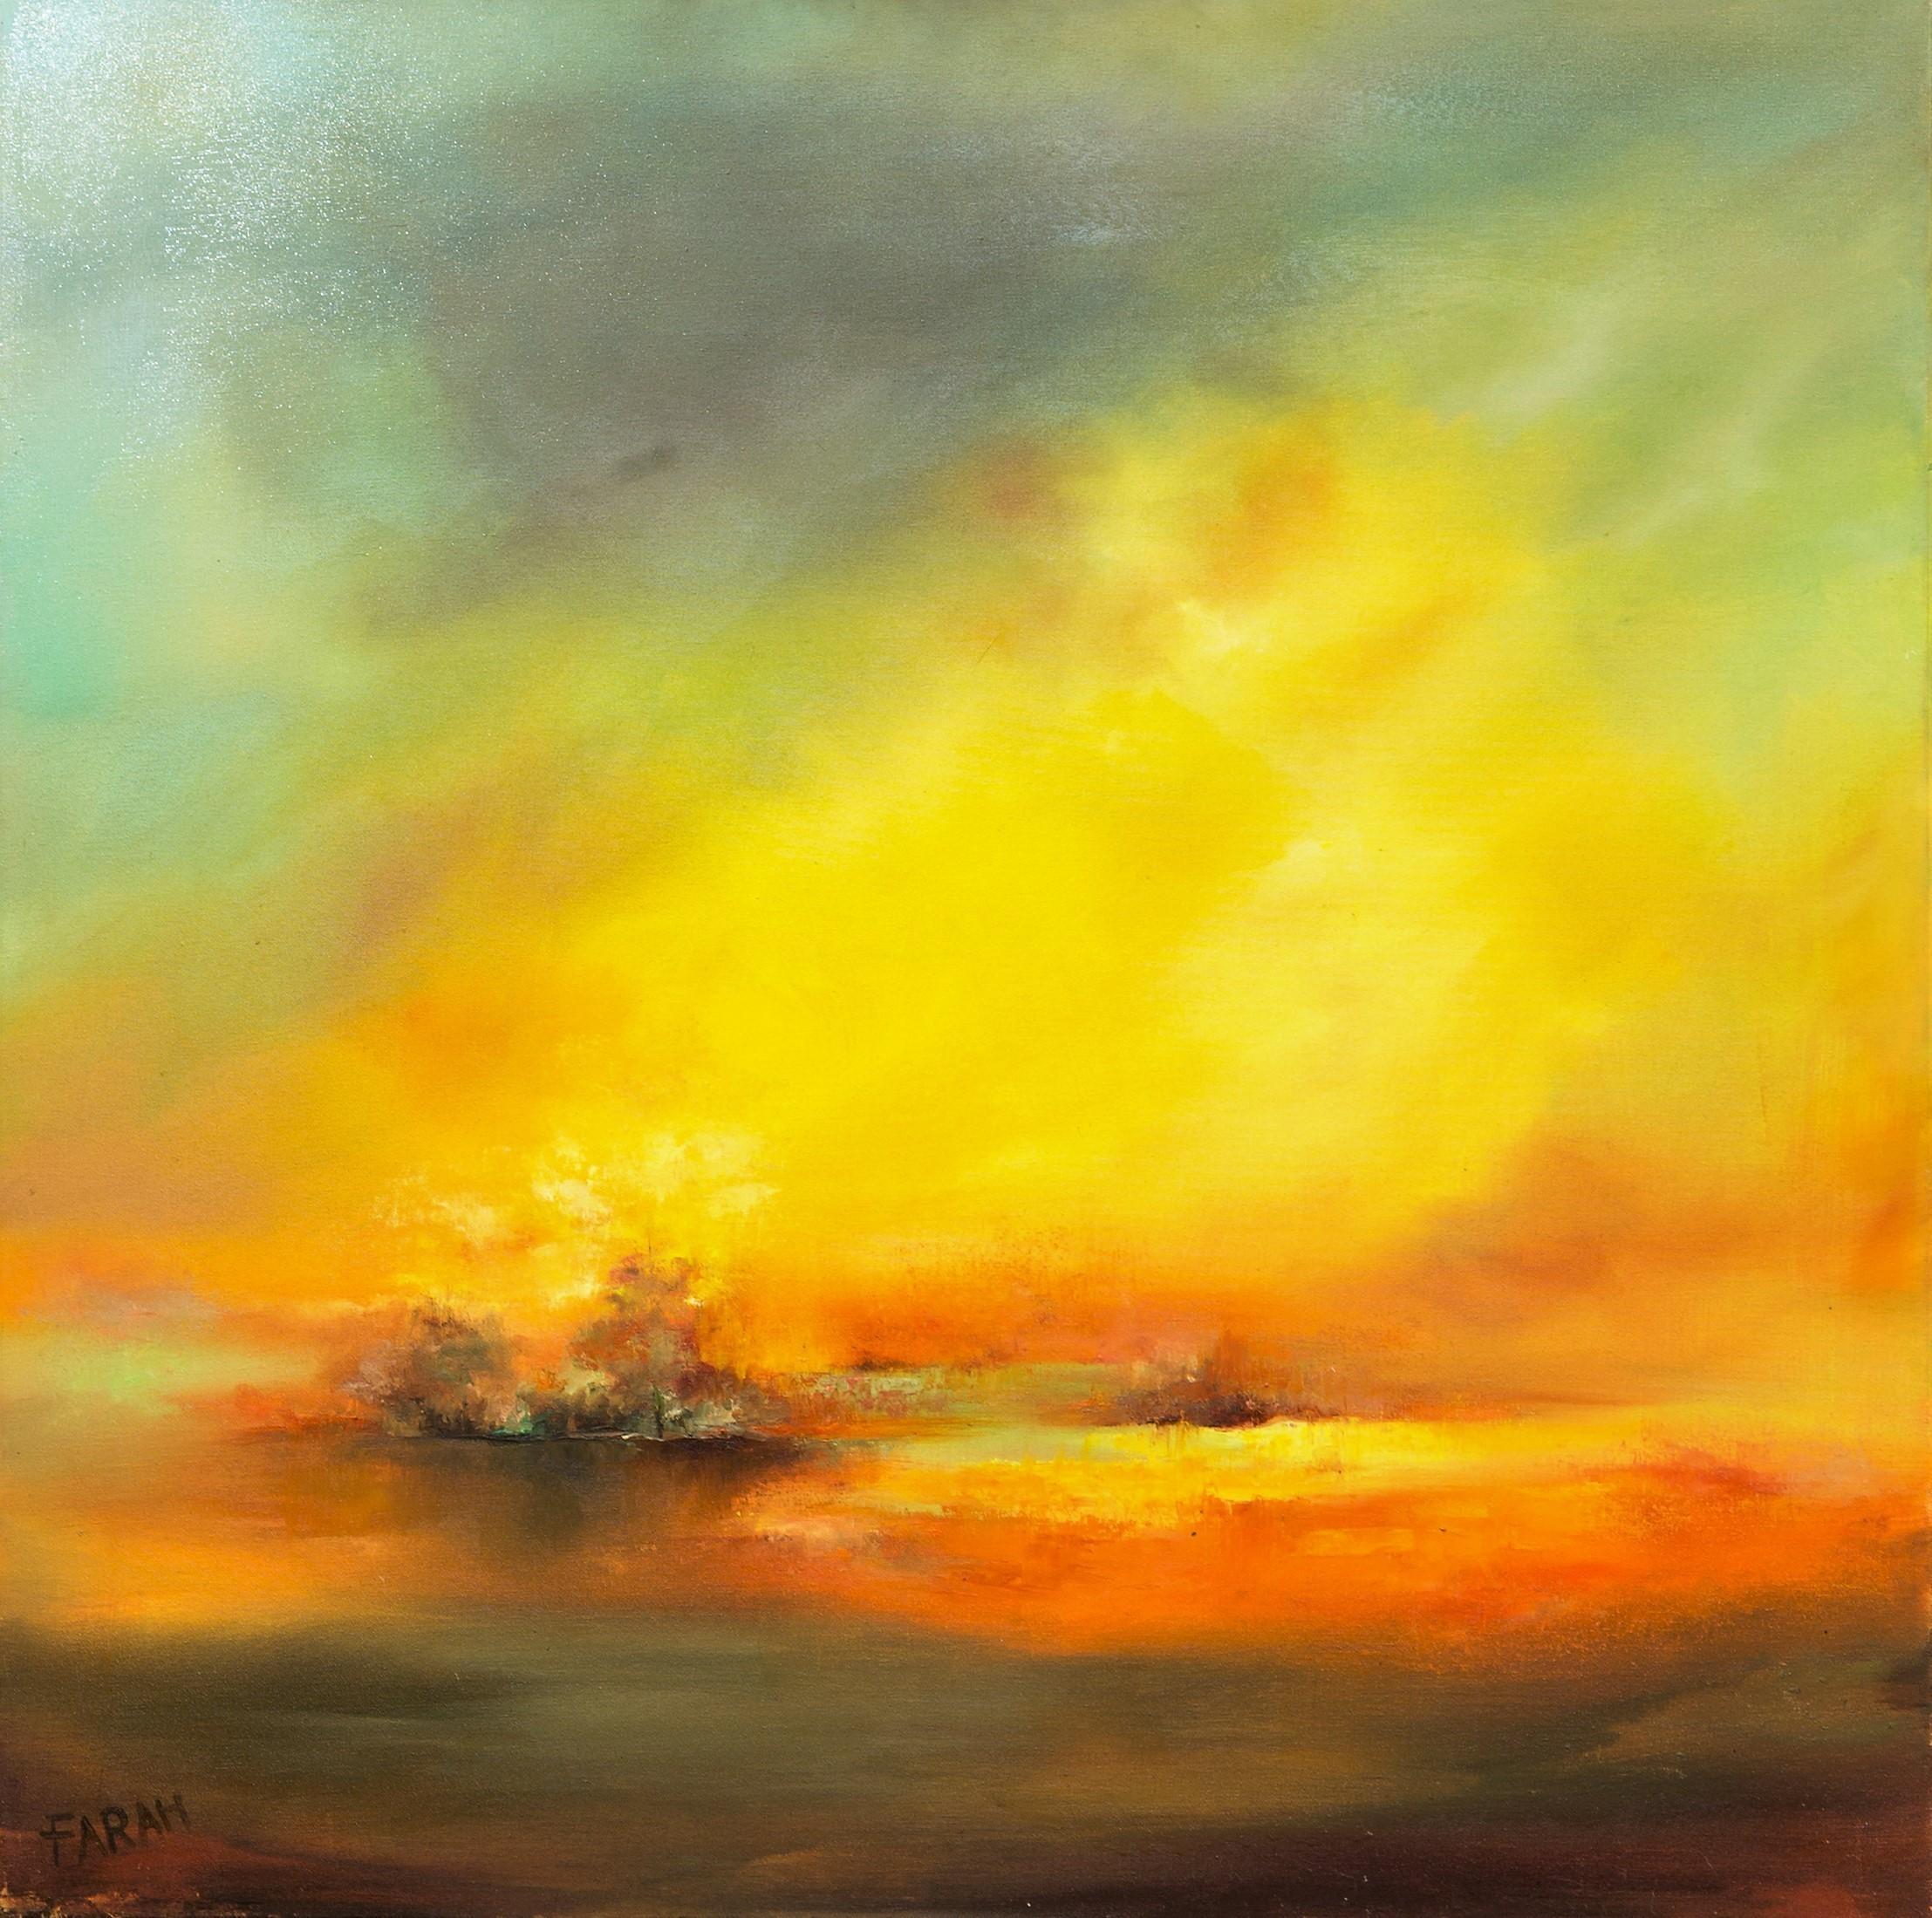 Farahnaz Samari-Sunset-Original Oil Painting 36x36